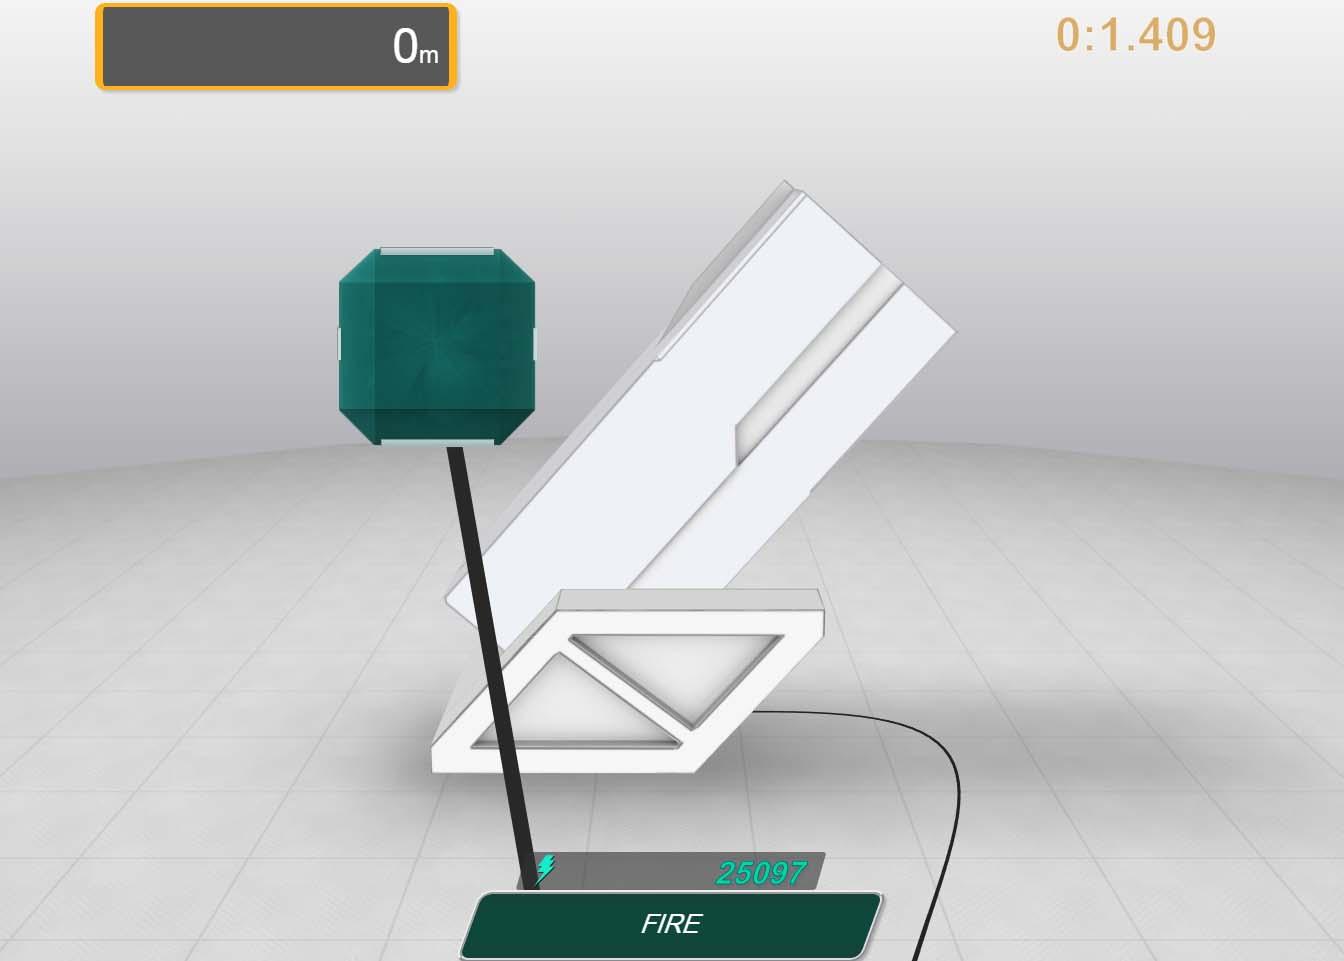 Boxgun - A Simple Projectile Game